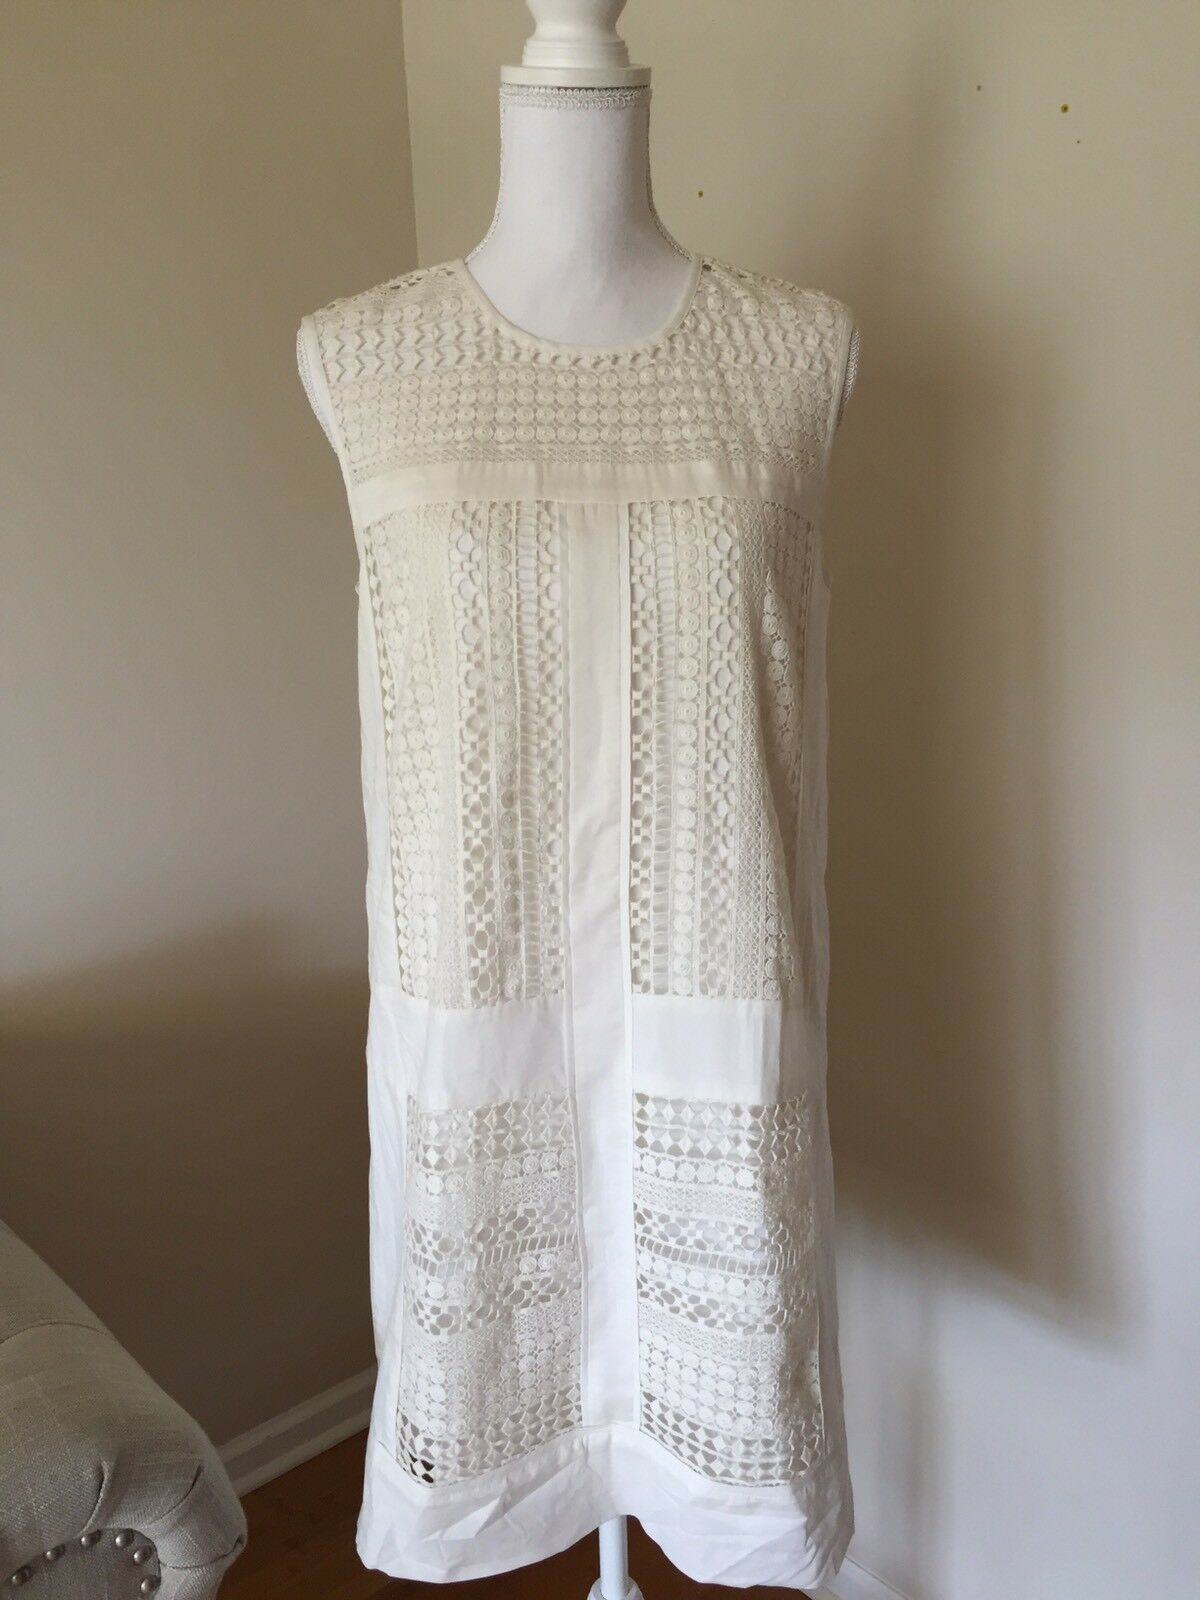 NEW J.Crew Lace Sleeveless Cotton Shift Dress C6549 Size S Small White  148